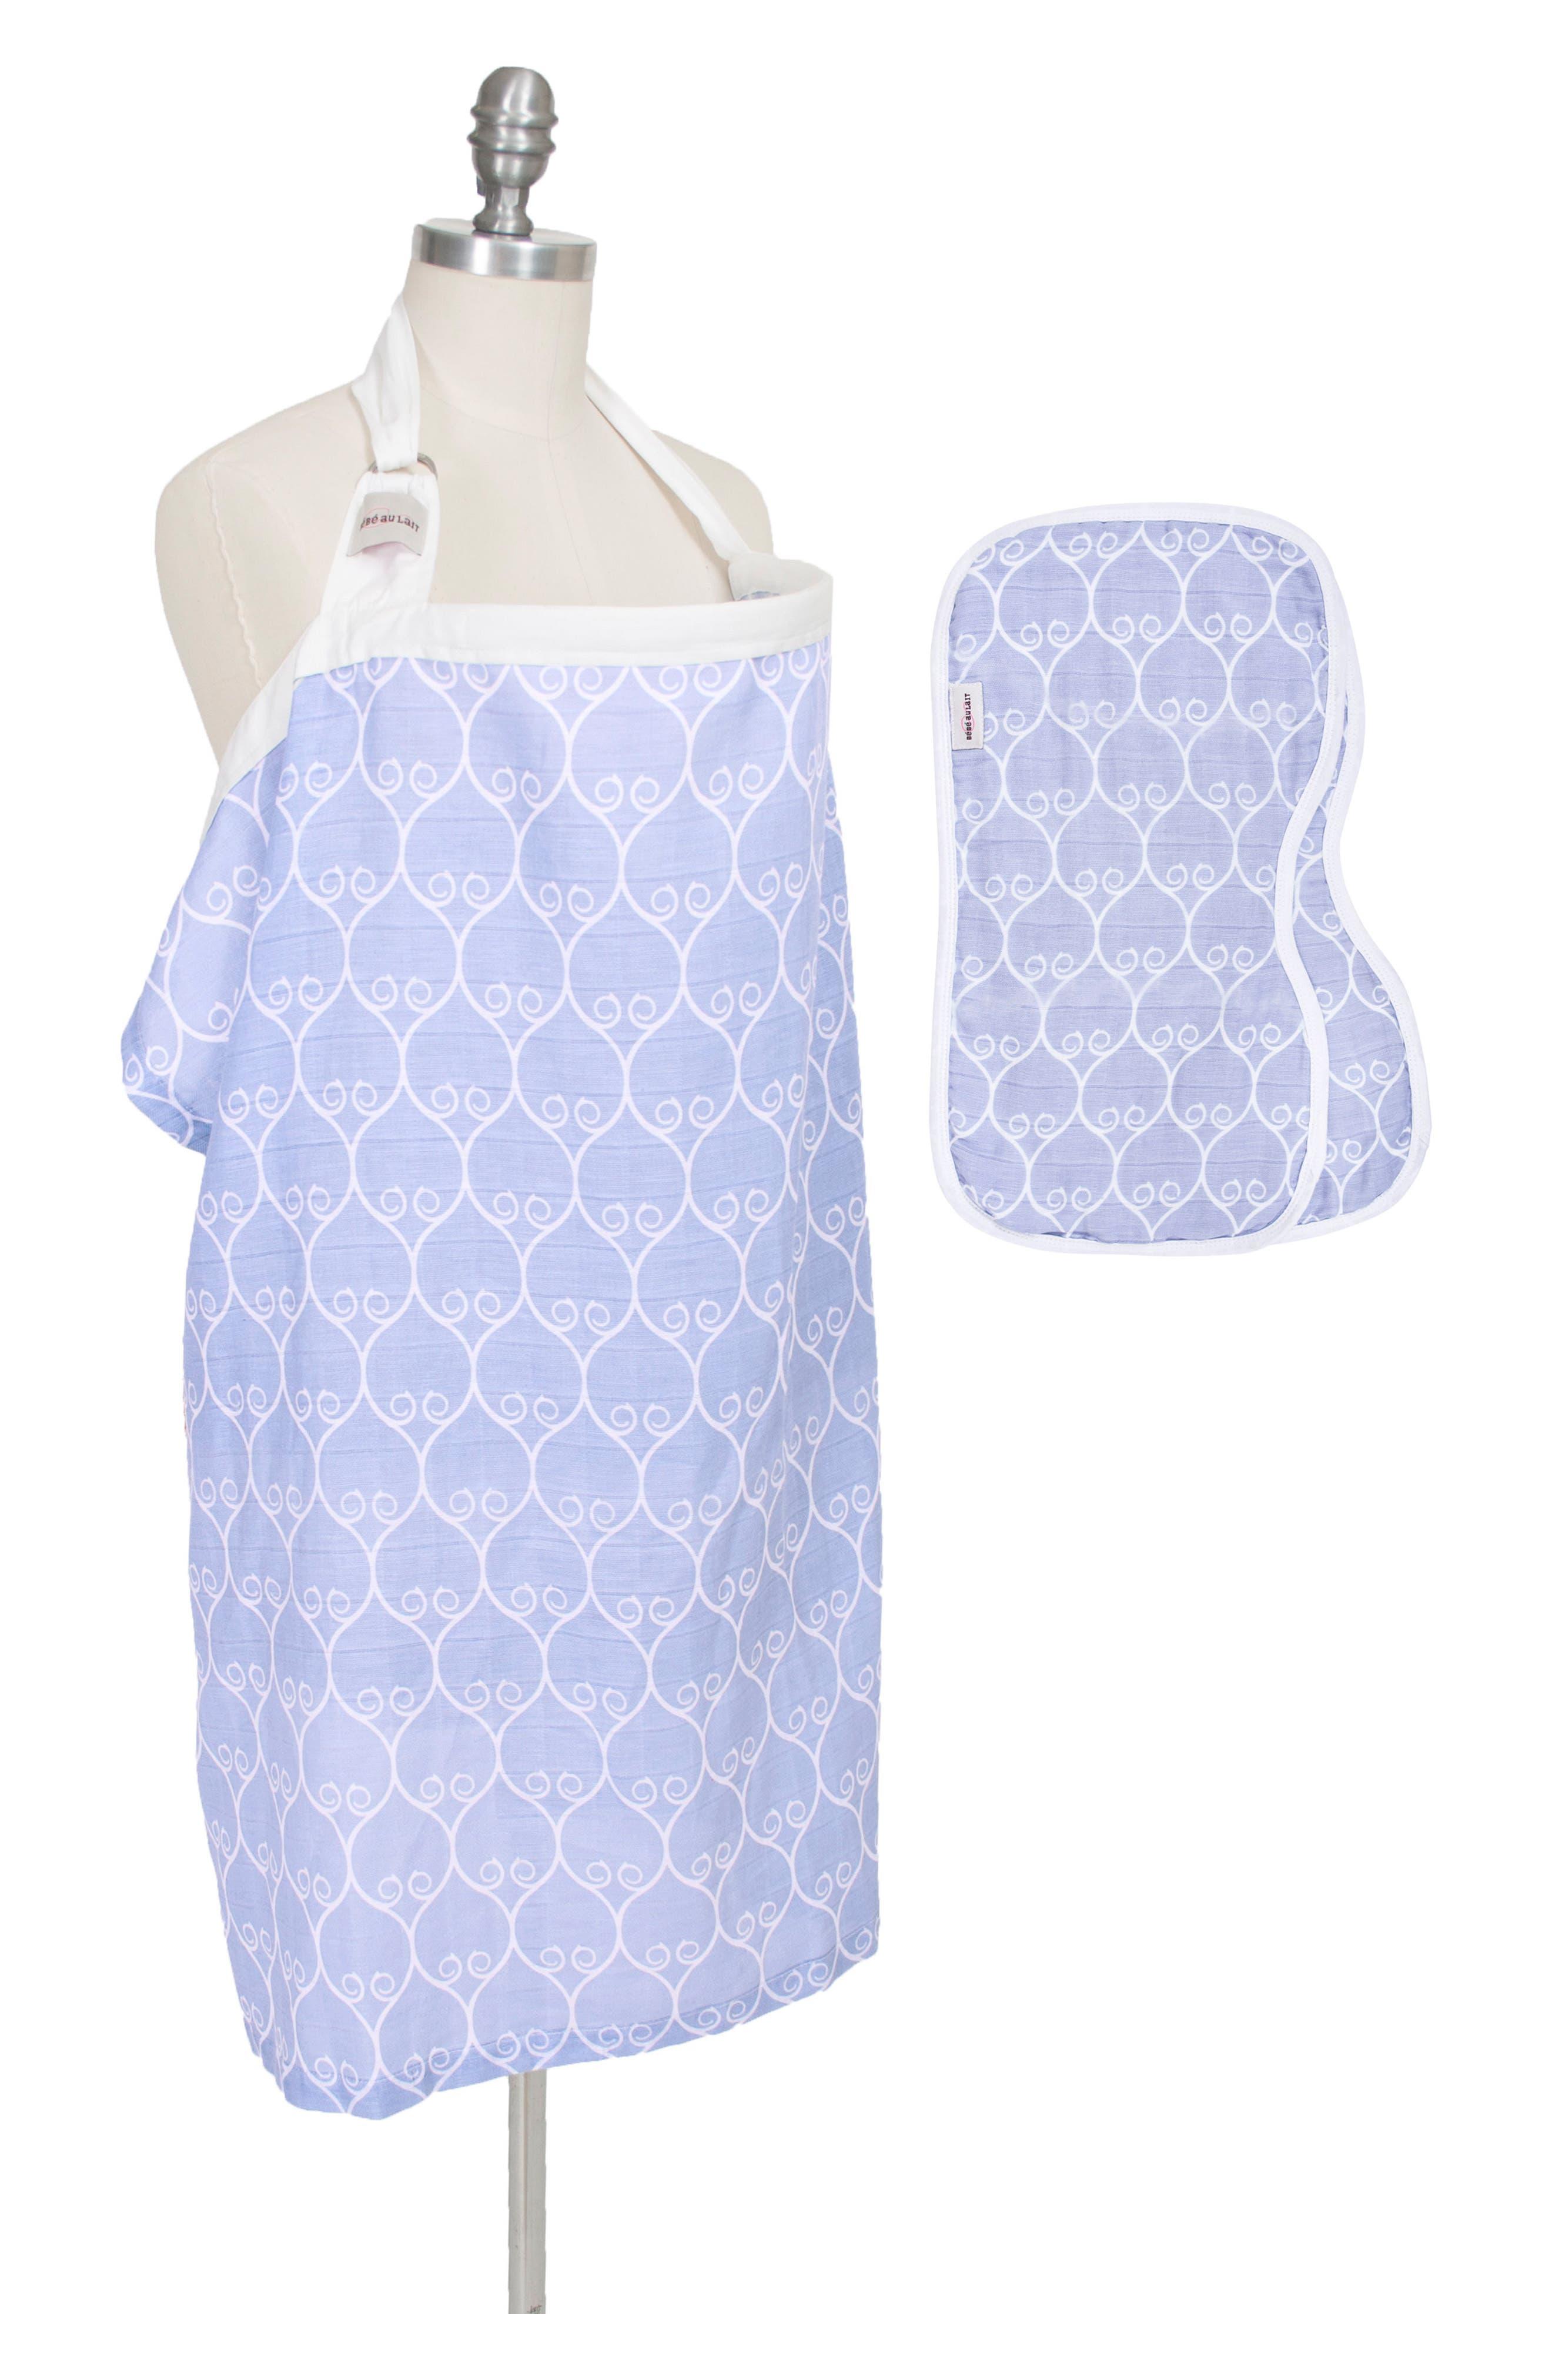 Nursing Cover & Burp Cloth Set,                             Main thumbnail 1, color,                             420